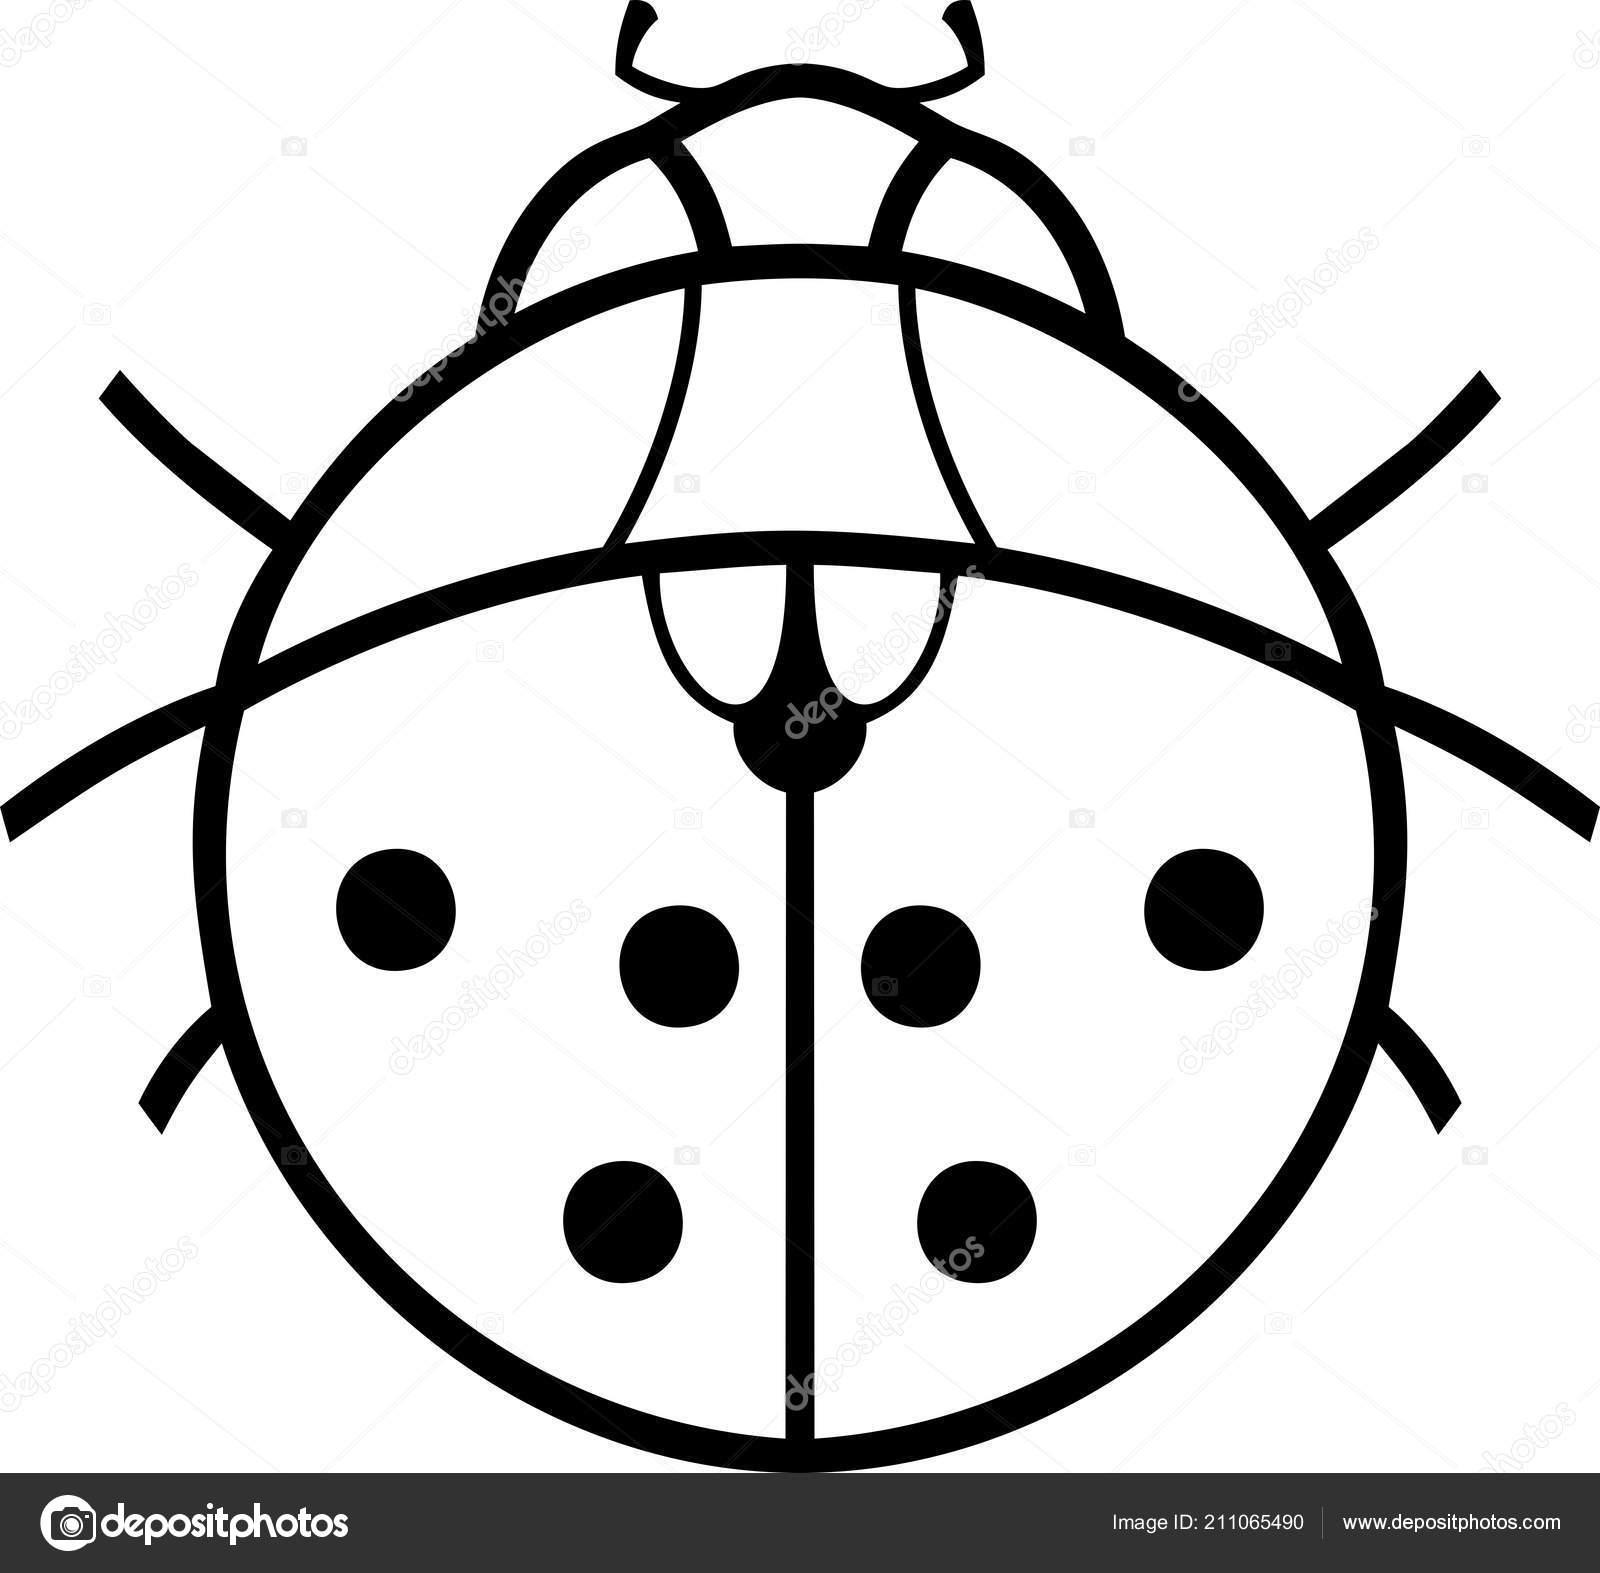 Coloring Page Stylized Cartoon Ladybird Stock Vector C Mariaflaya